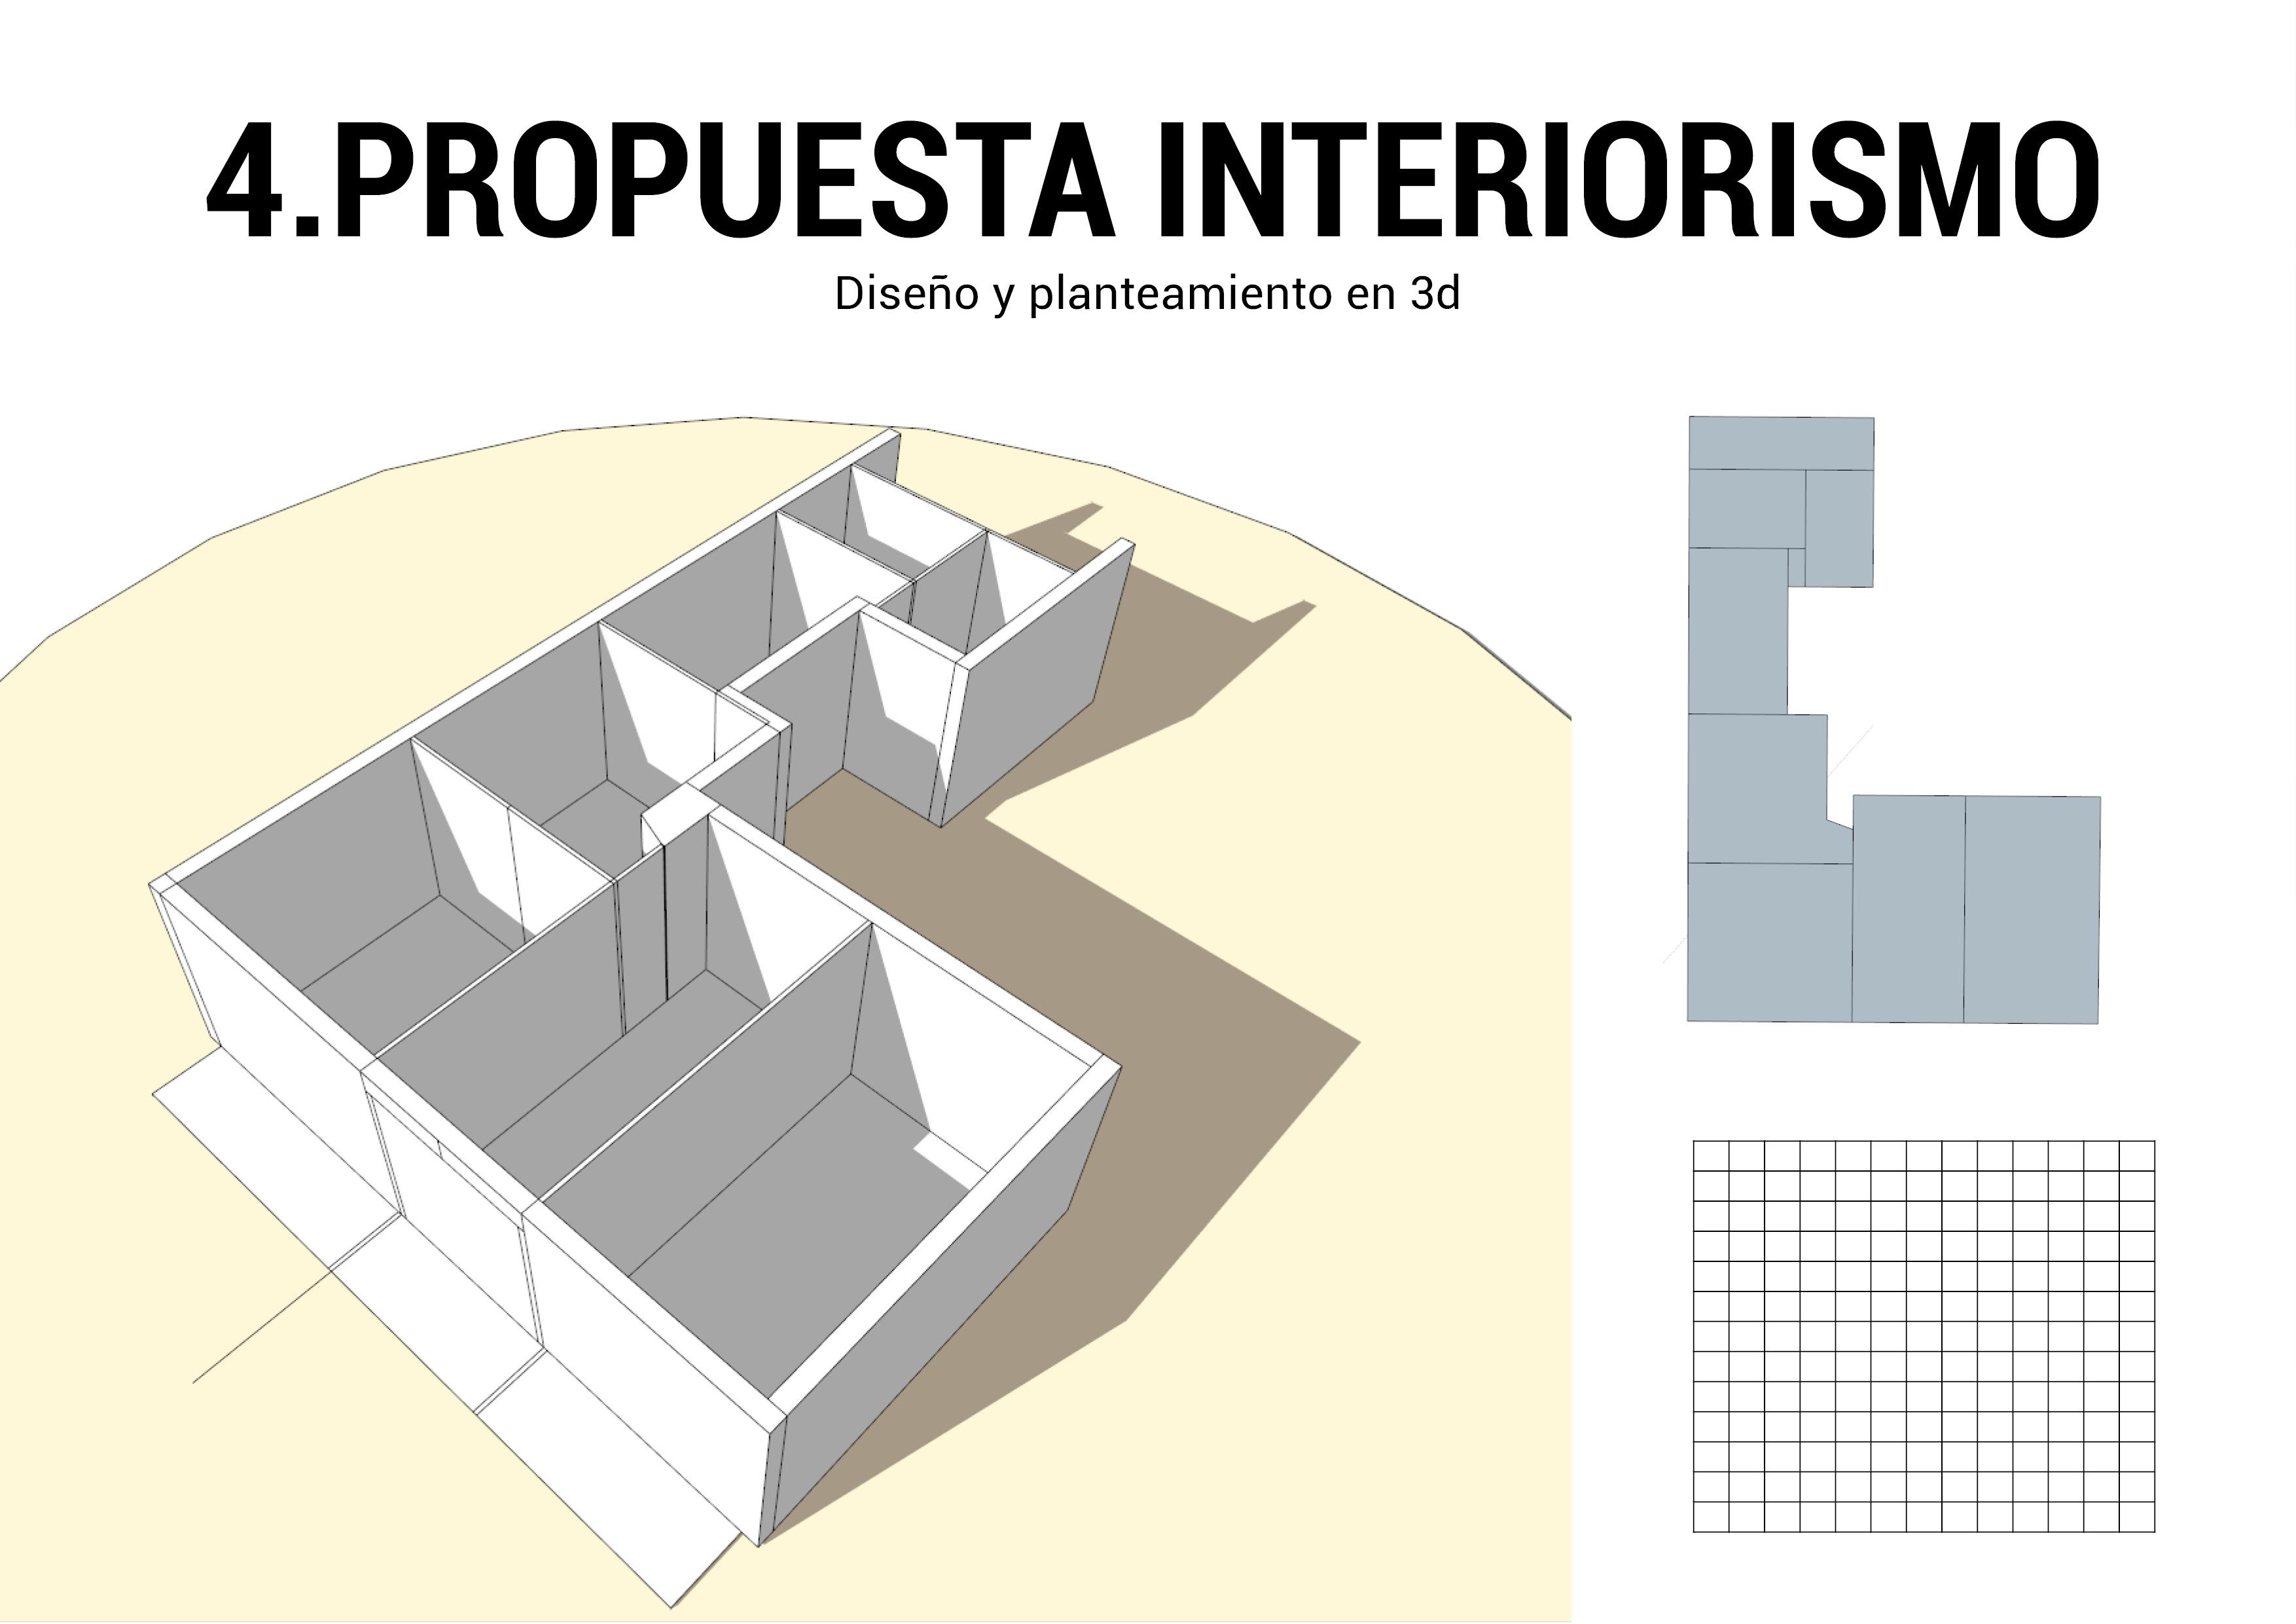 PROPUESTA INTERIORISMO CHESTE 26